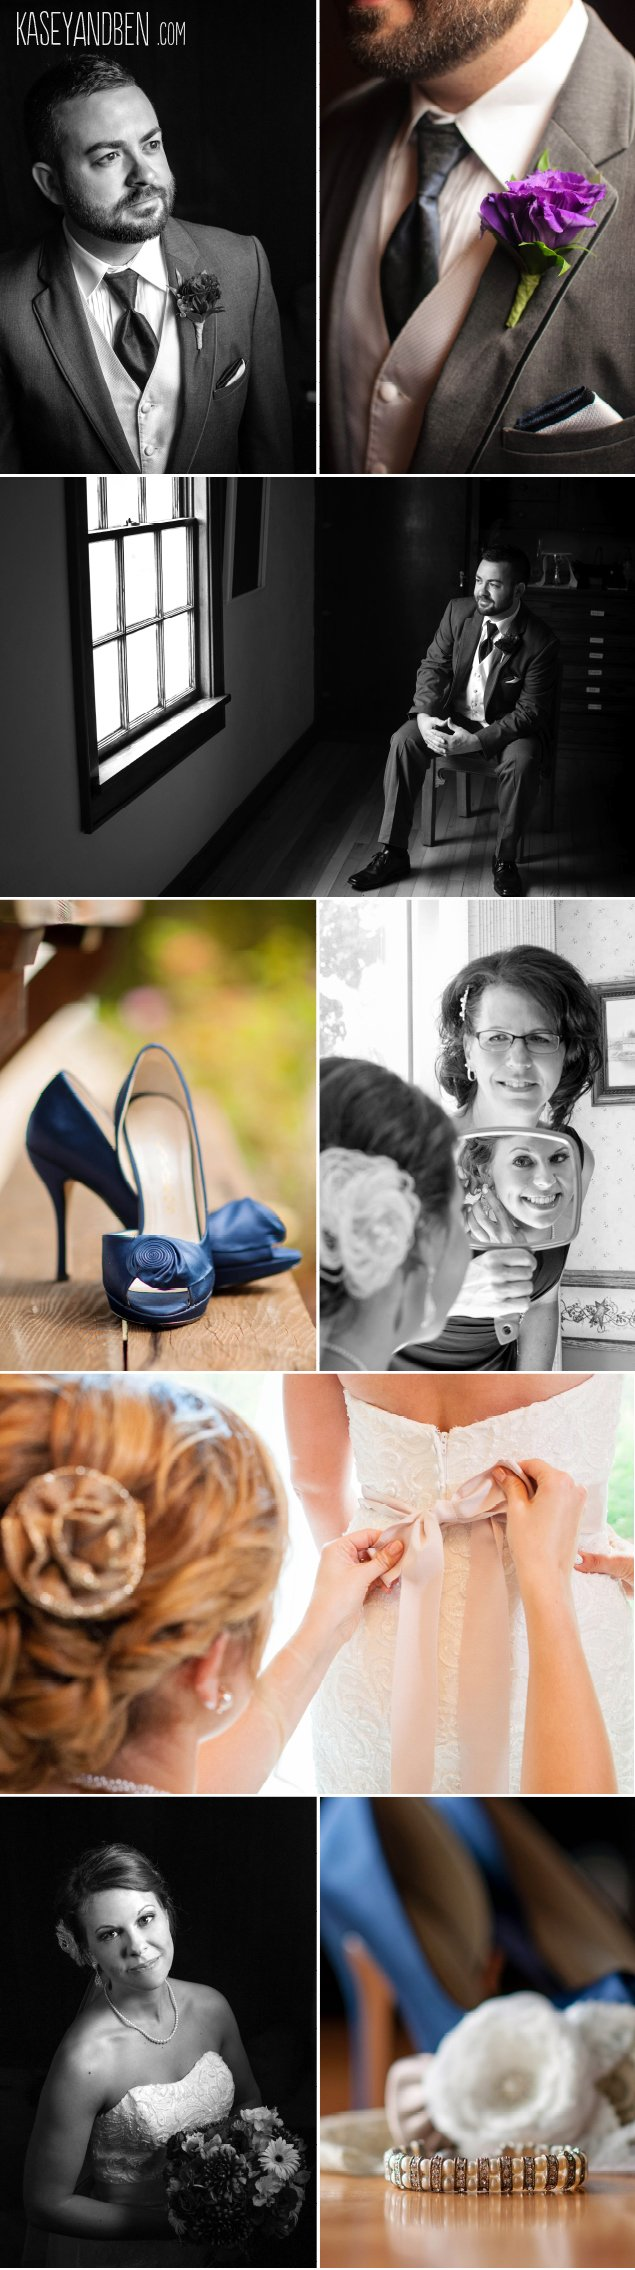 Wisconsin_Wedding_Denmark_Fall_Autumn_Voyeger_Park_Photos_1